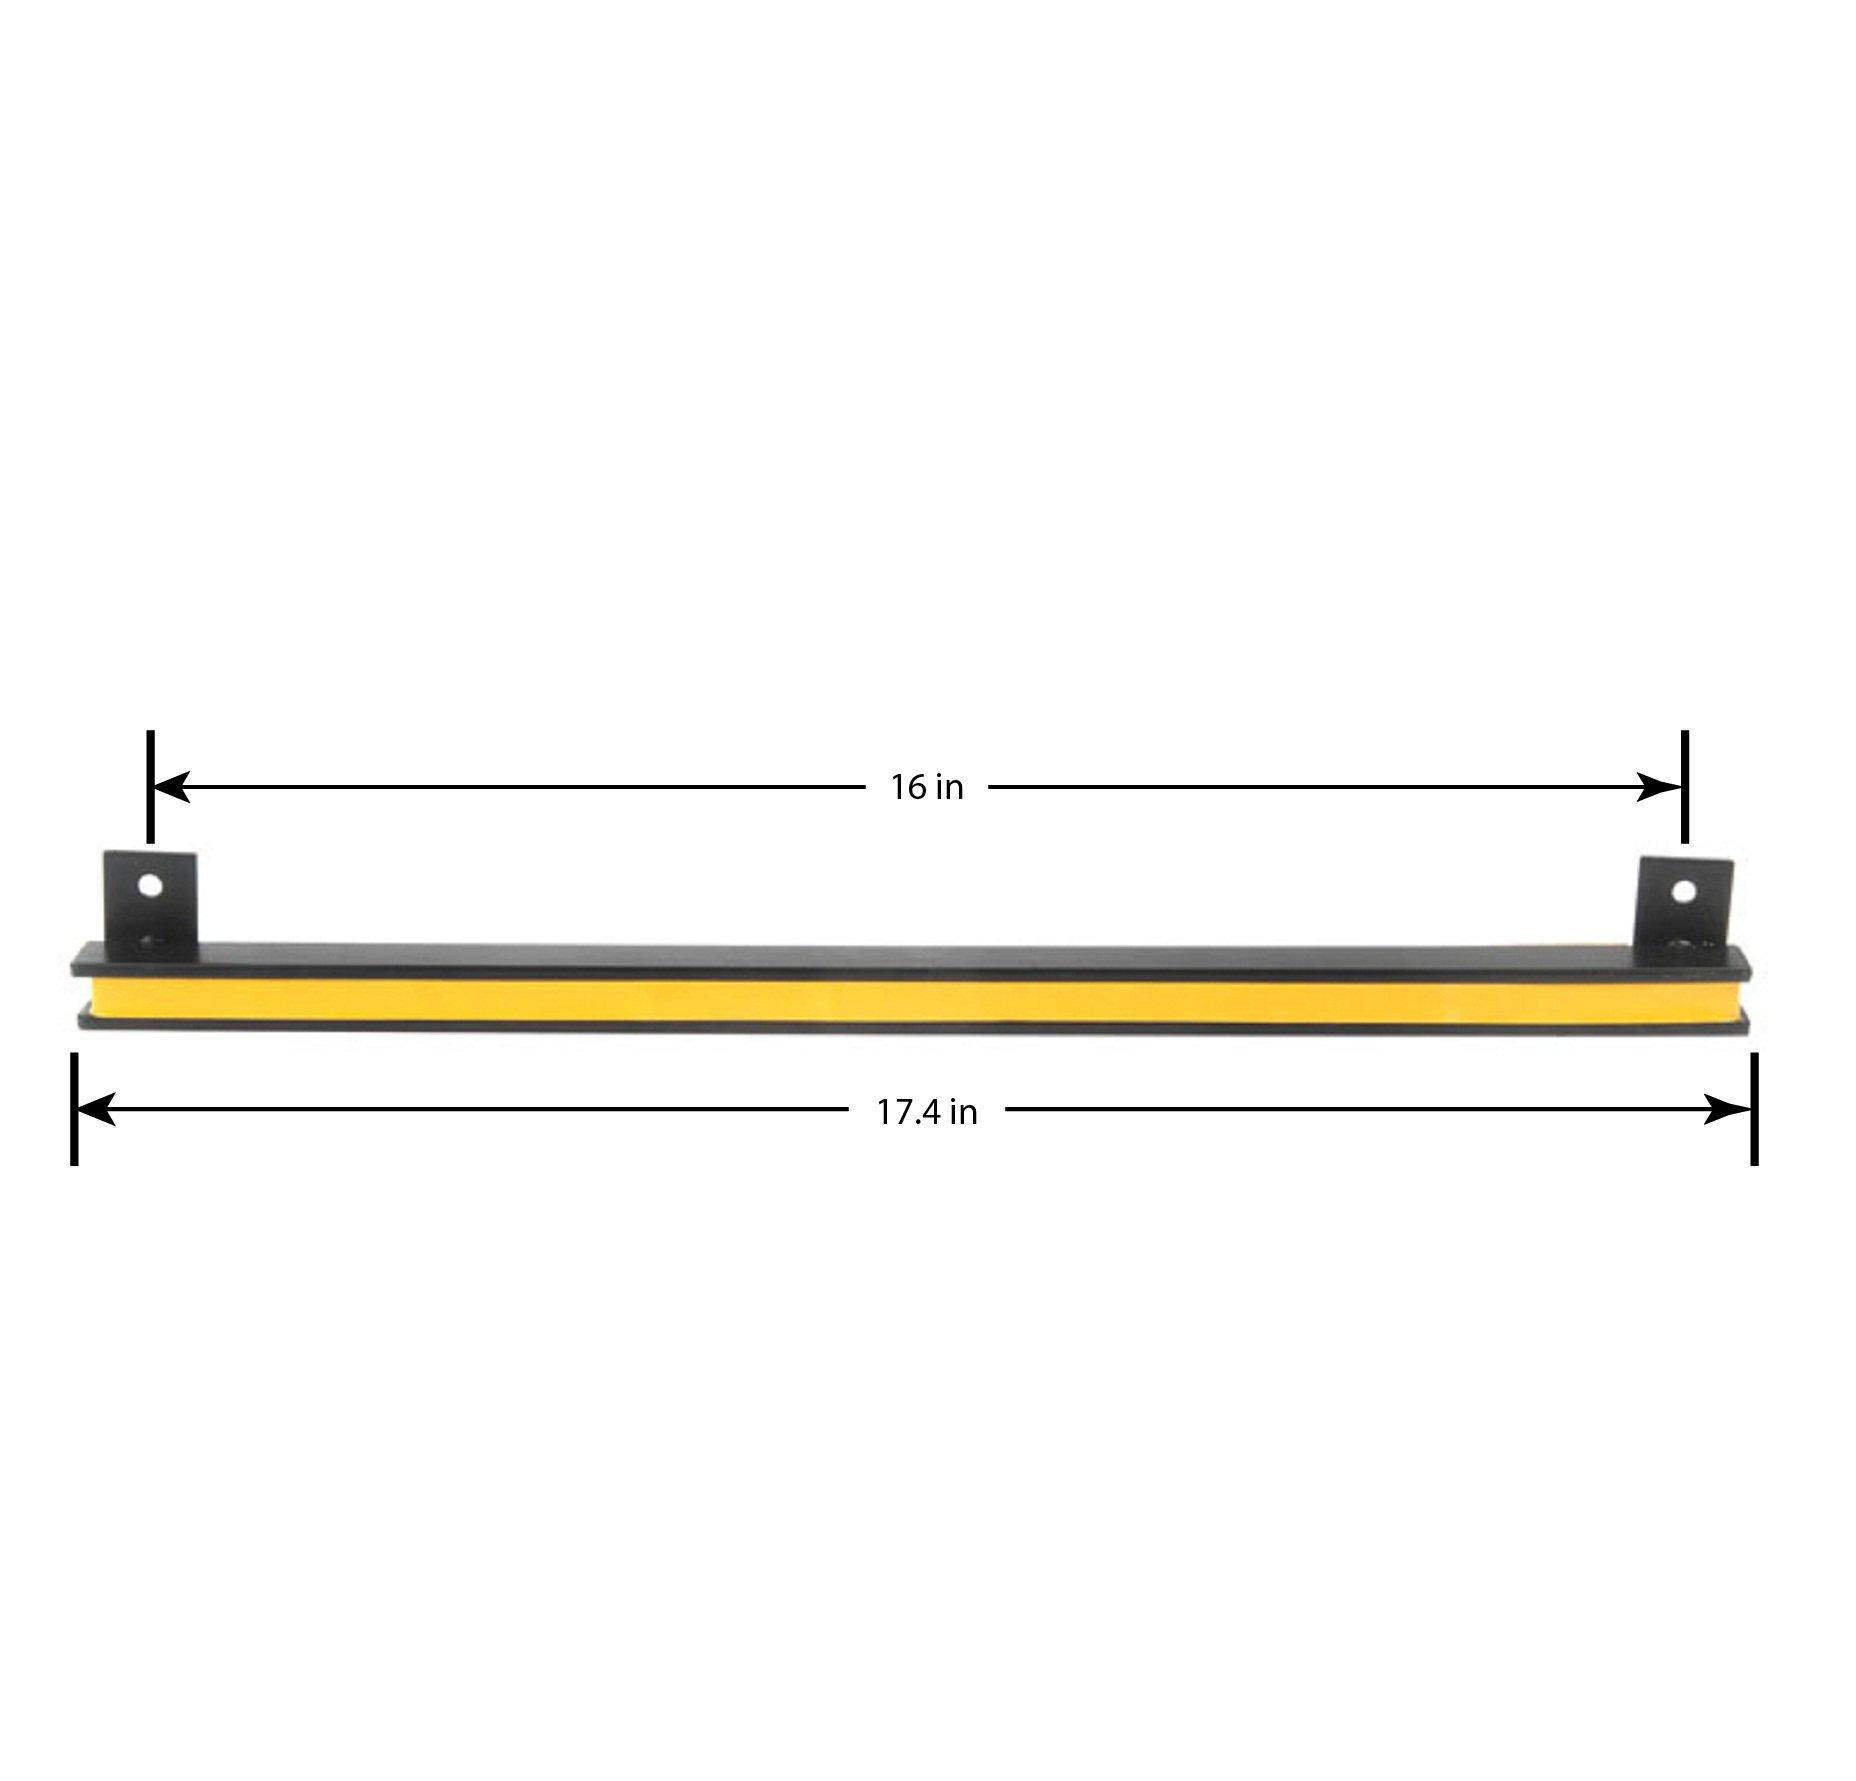 Dorman Hardware 4-9995 Magnetic Tool Bar, 16 Inch by Dorman Hardware (Image #3)